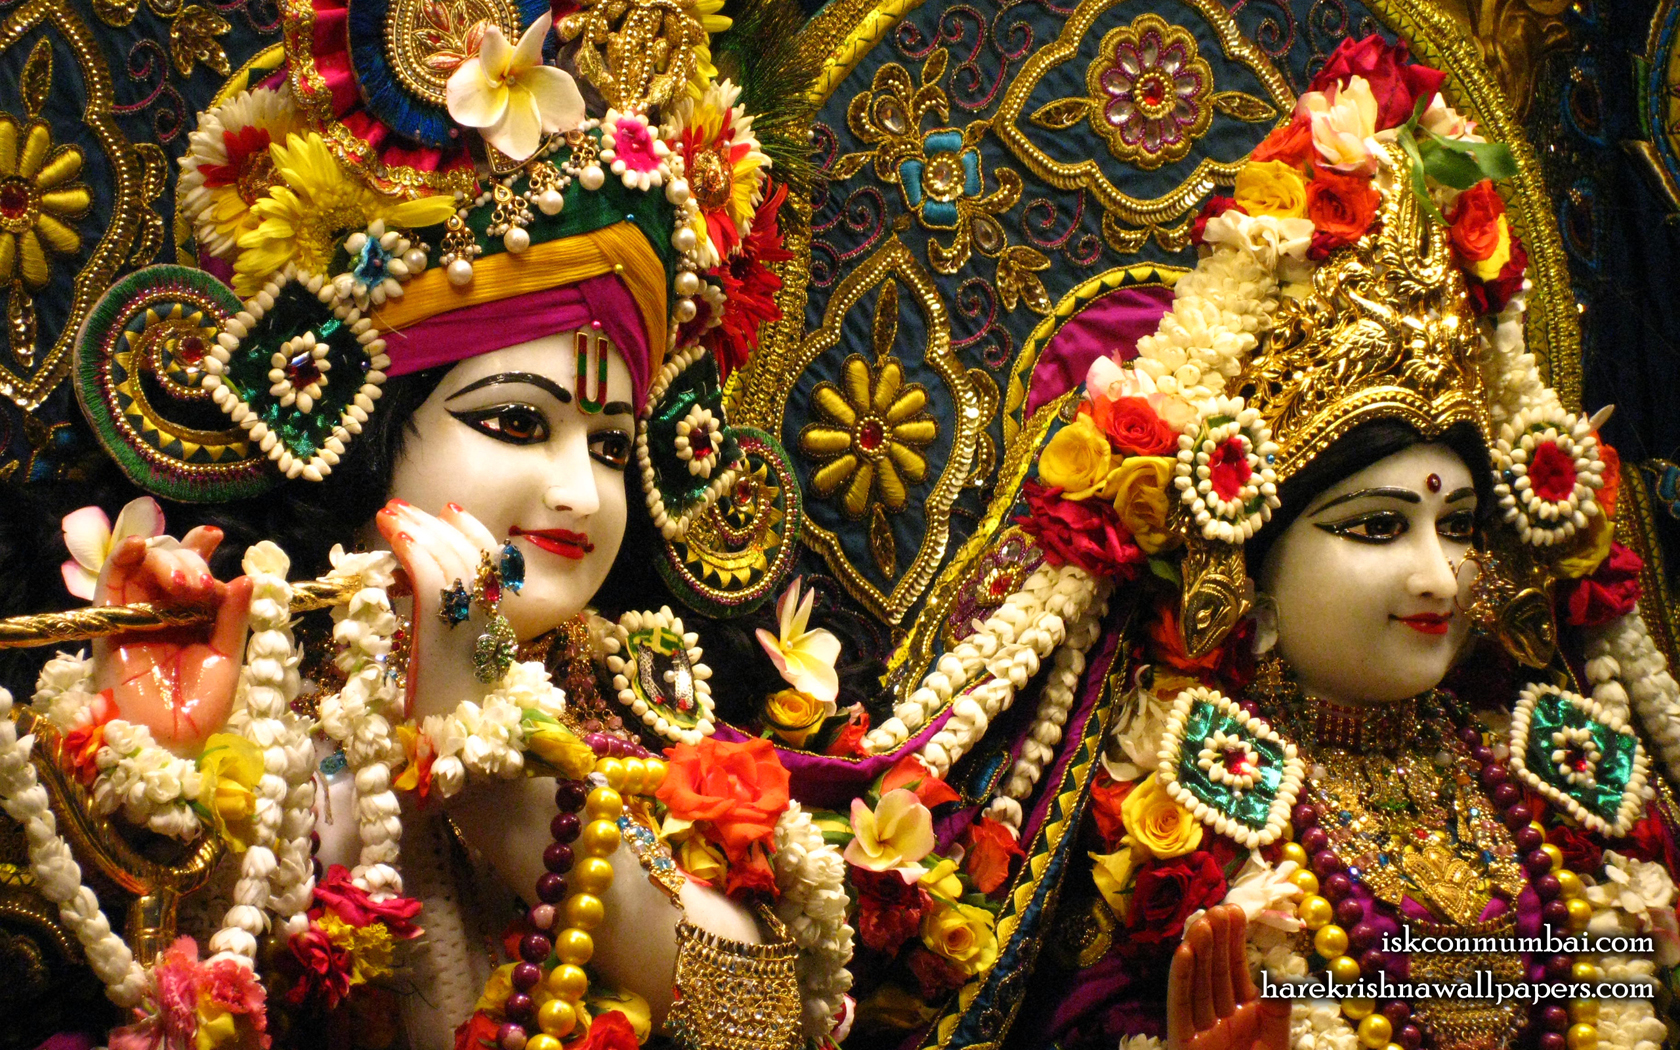 Sri Sri Radha Rasabihari Close up Wallpaper (027) Size 1680x1050 Download